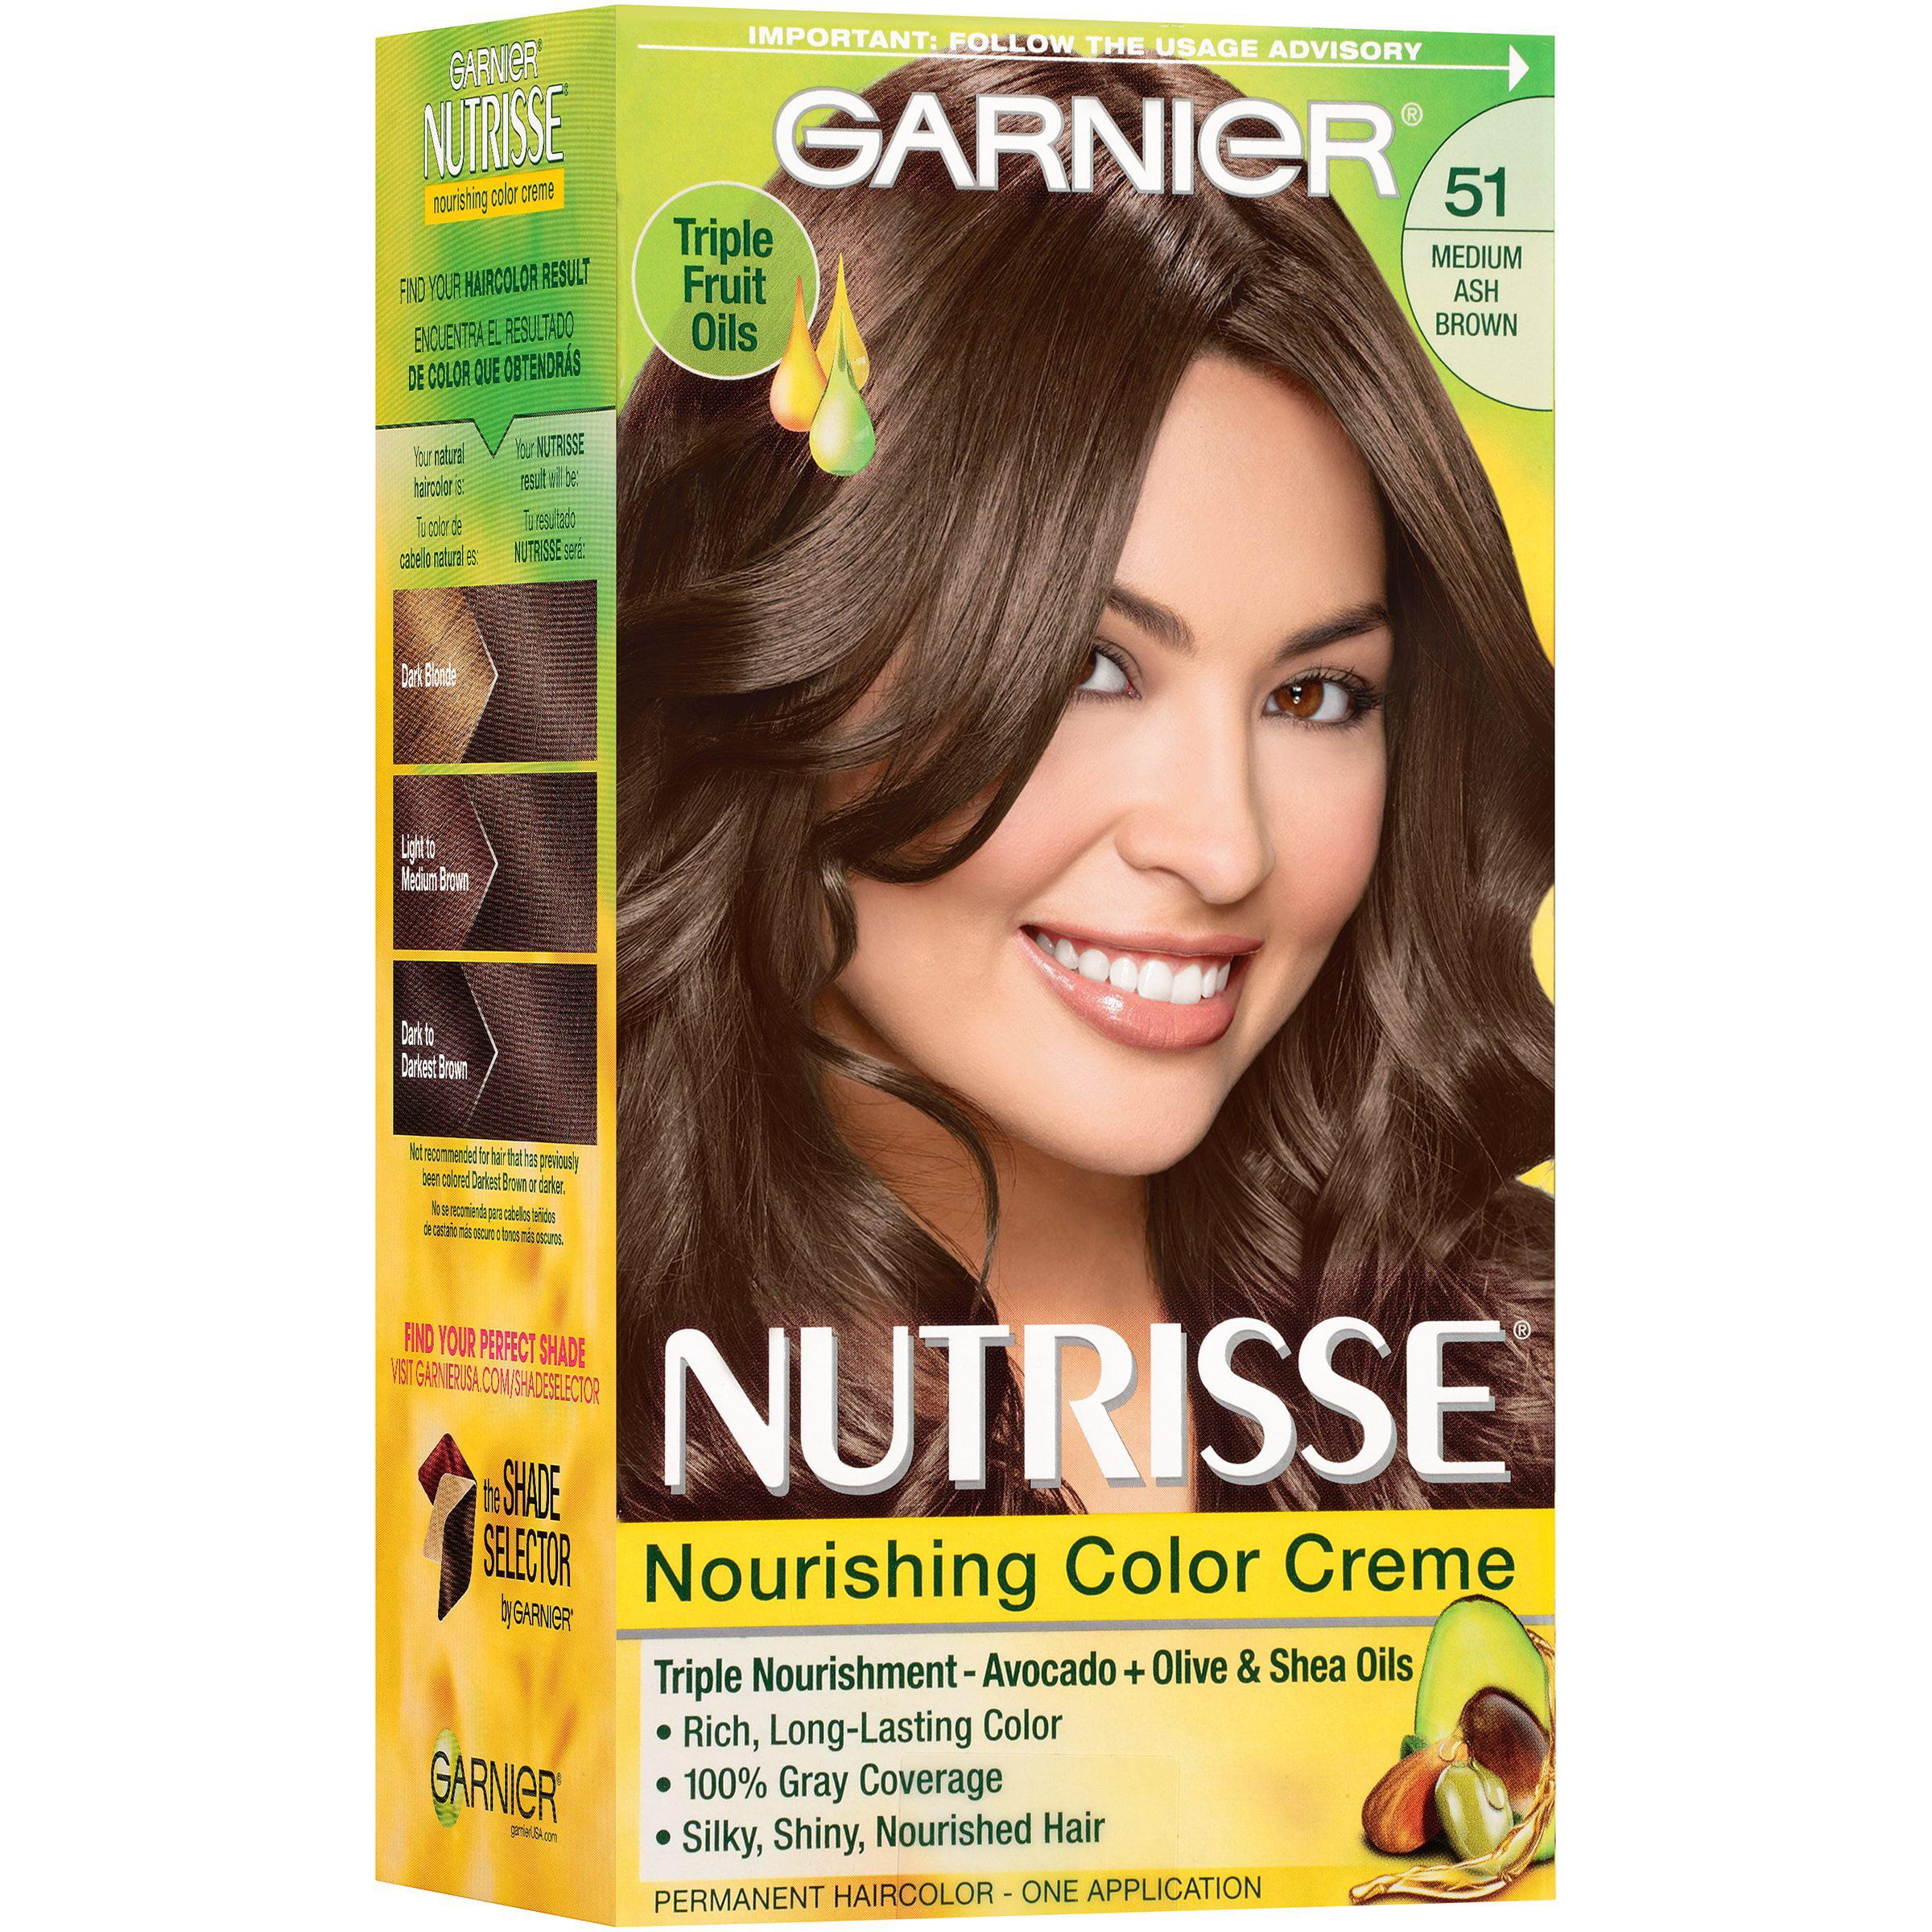 Garnier Nutrisse Nourishing Color Creme Hair Color, 83 Medium ...